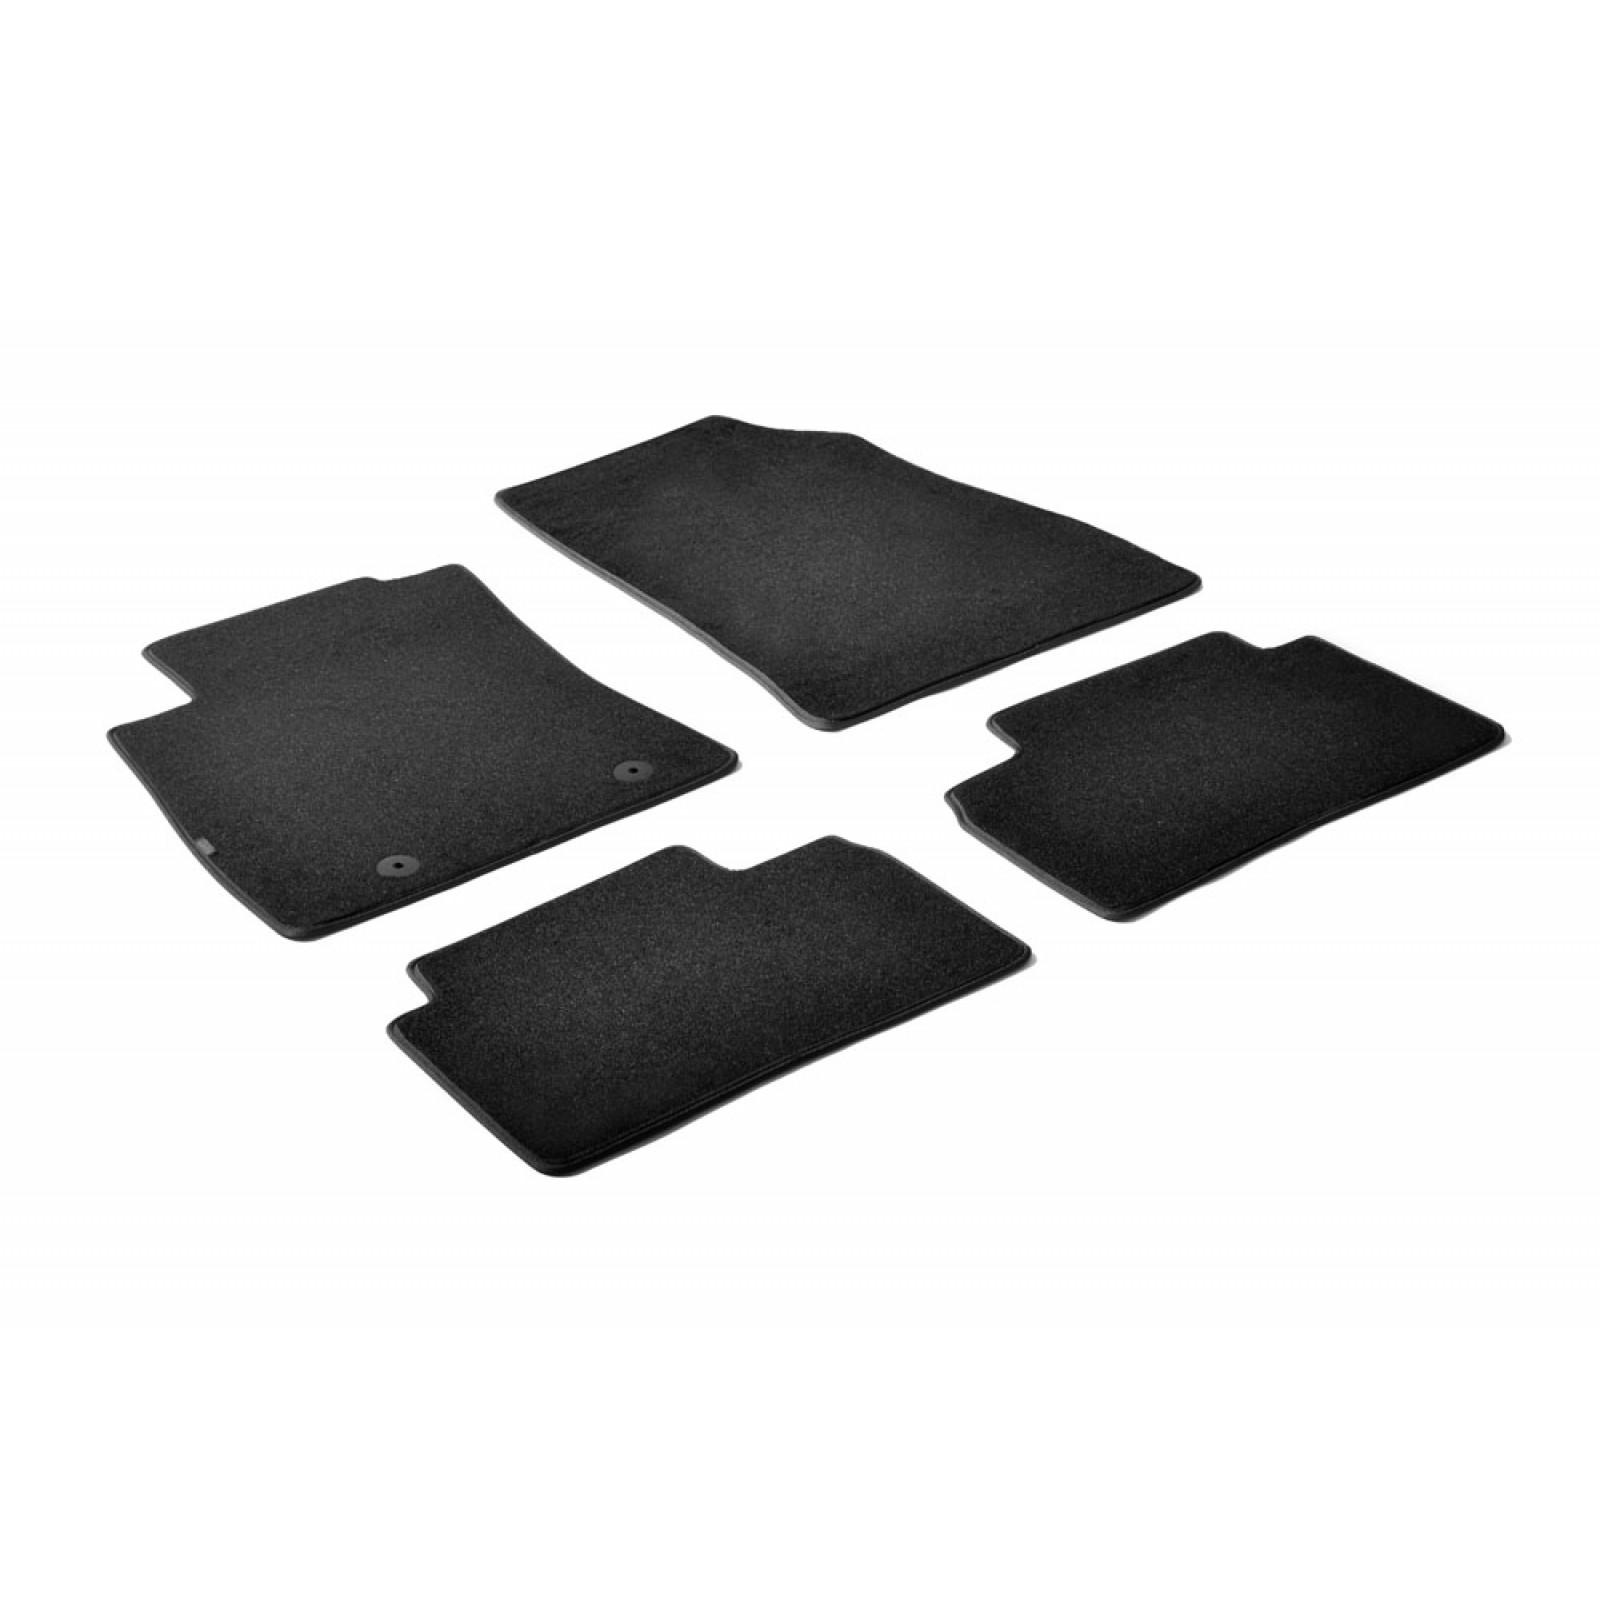 tapis en textile pour nissan juke. Black Bedroom Furniture Sets. Home Design Ideas